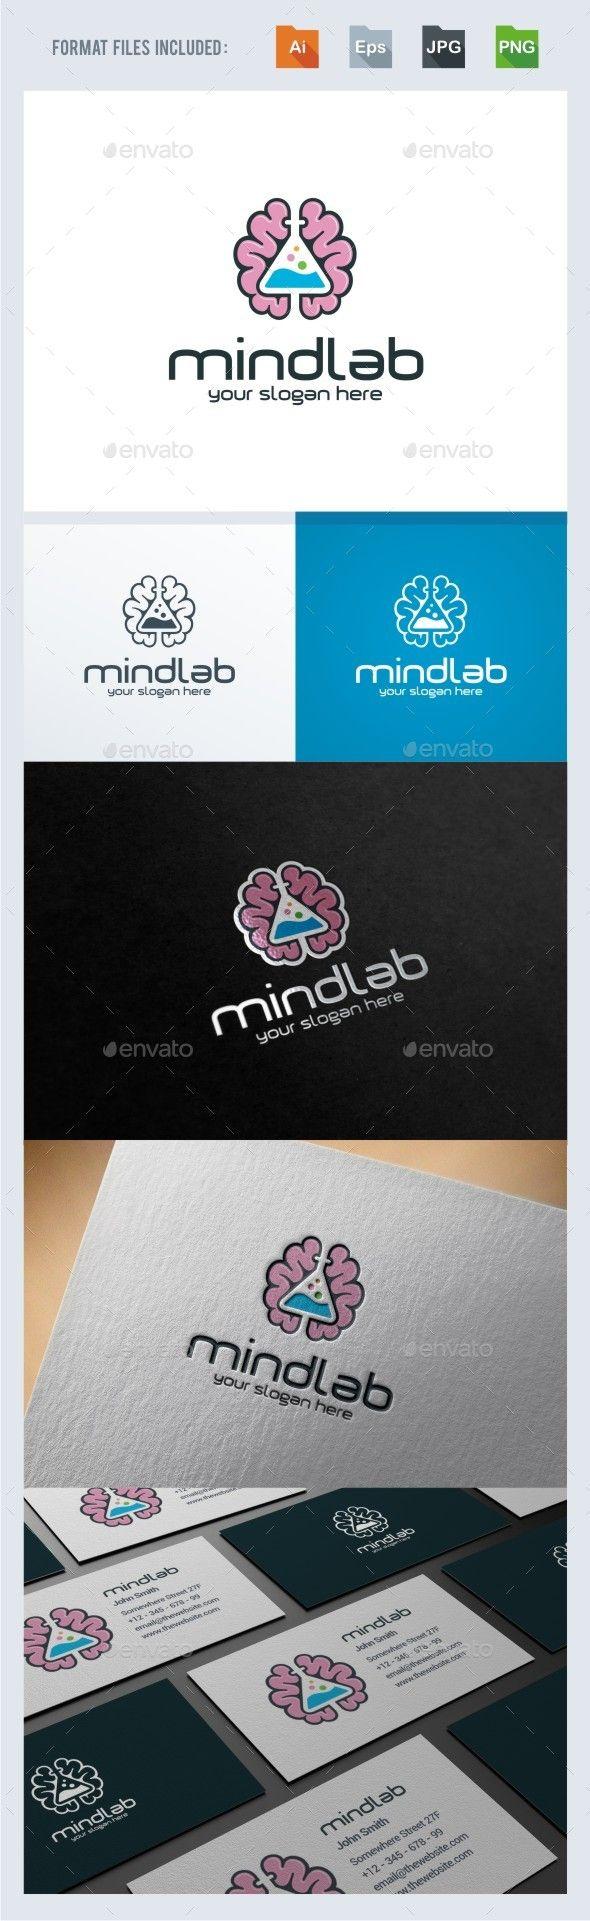 Mind Lab Logo Template | Pinterest | Ai illustrator, Logo templates ...